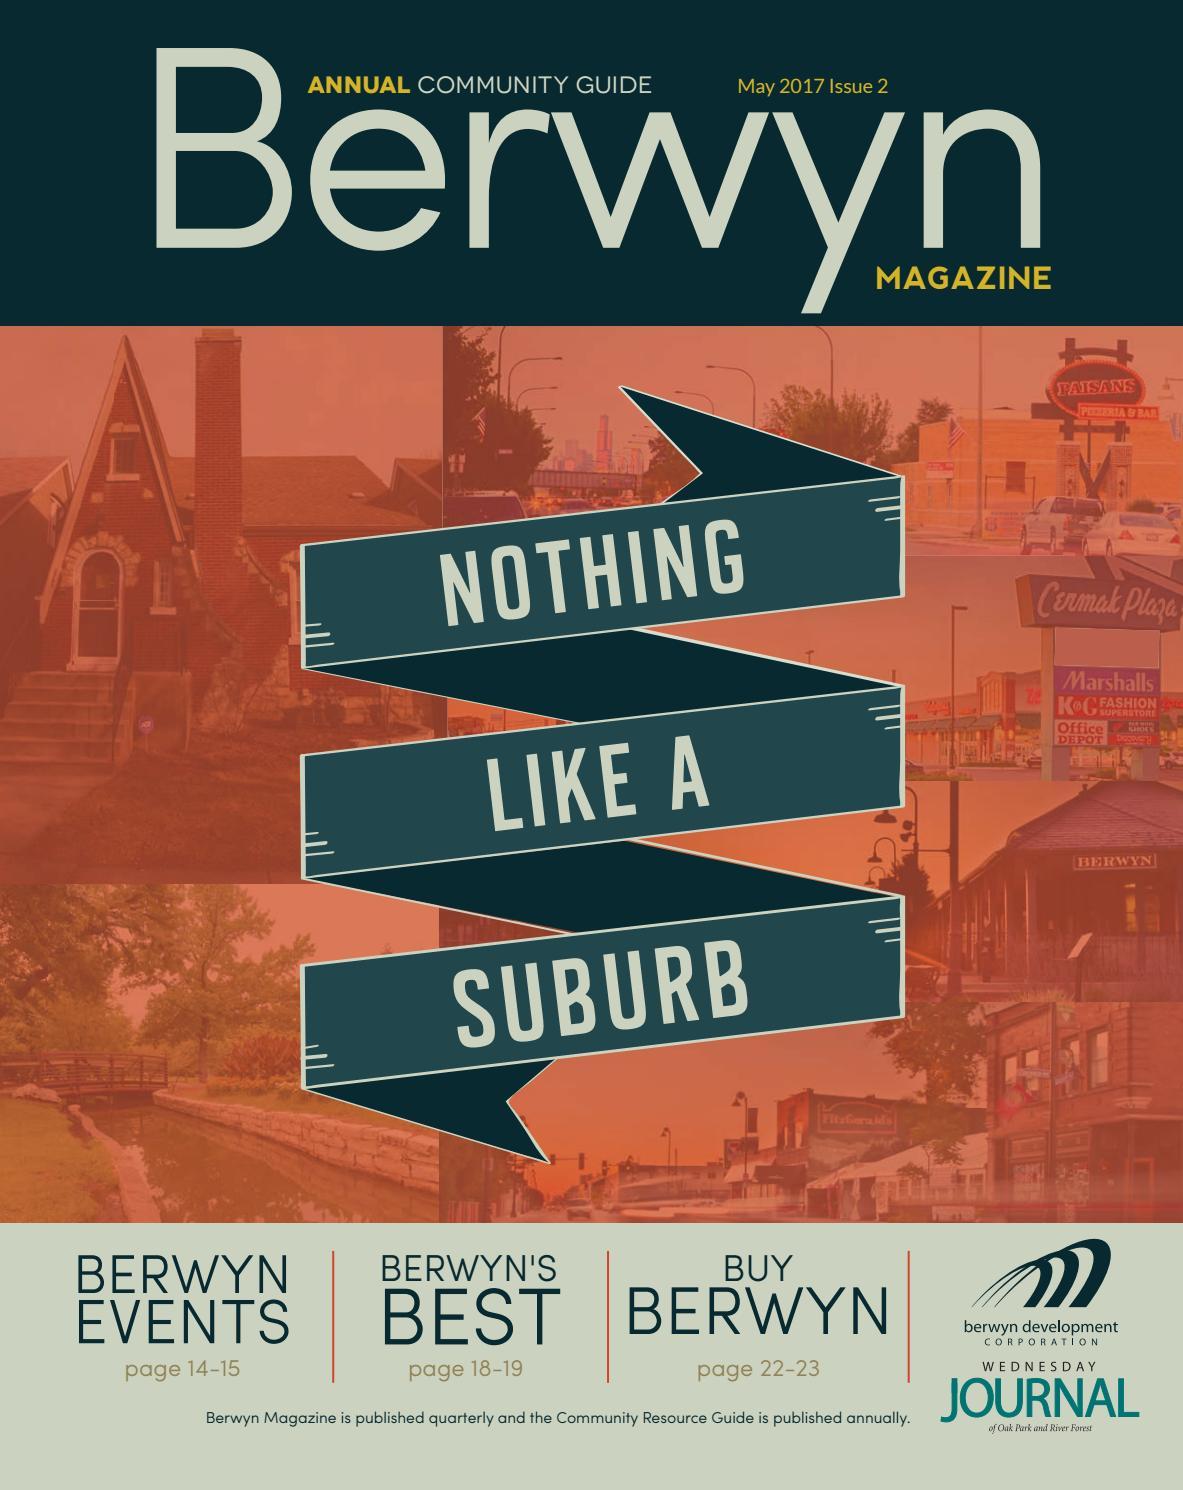 32241a51c3 2017 Berwyn Magazine and Community Resource Guide - Issue 2 by Berwyn  Development Corporation - issuu